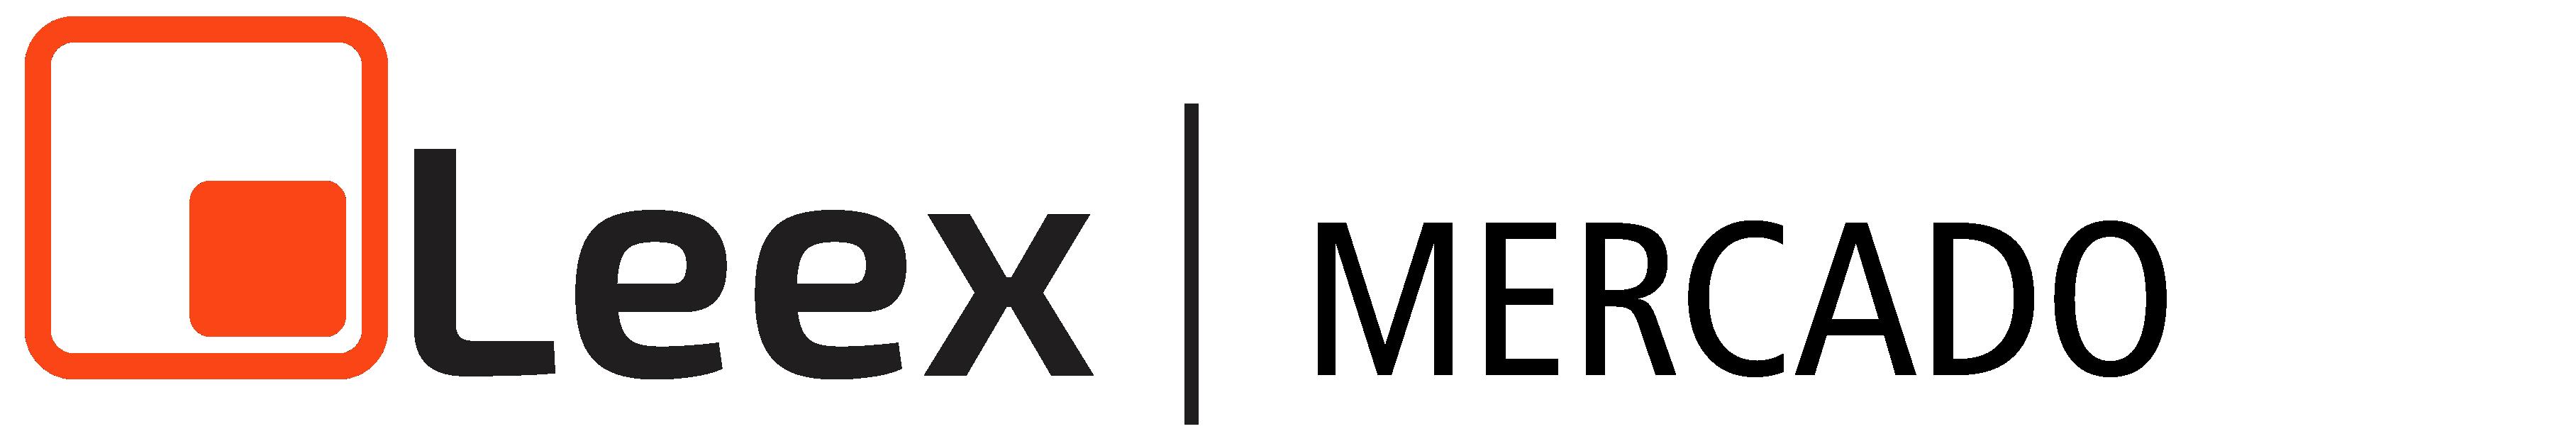 Logo Leex Mercado 280x66